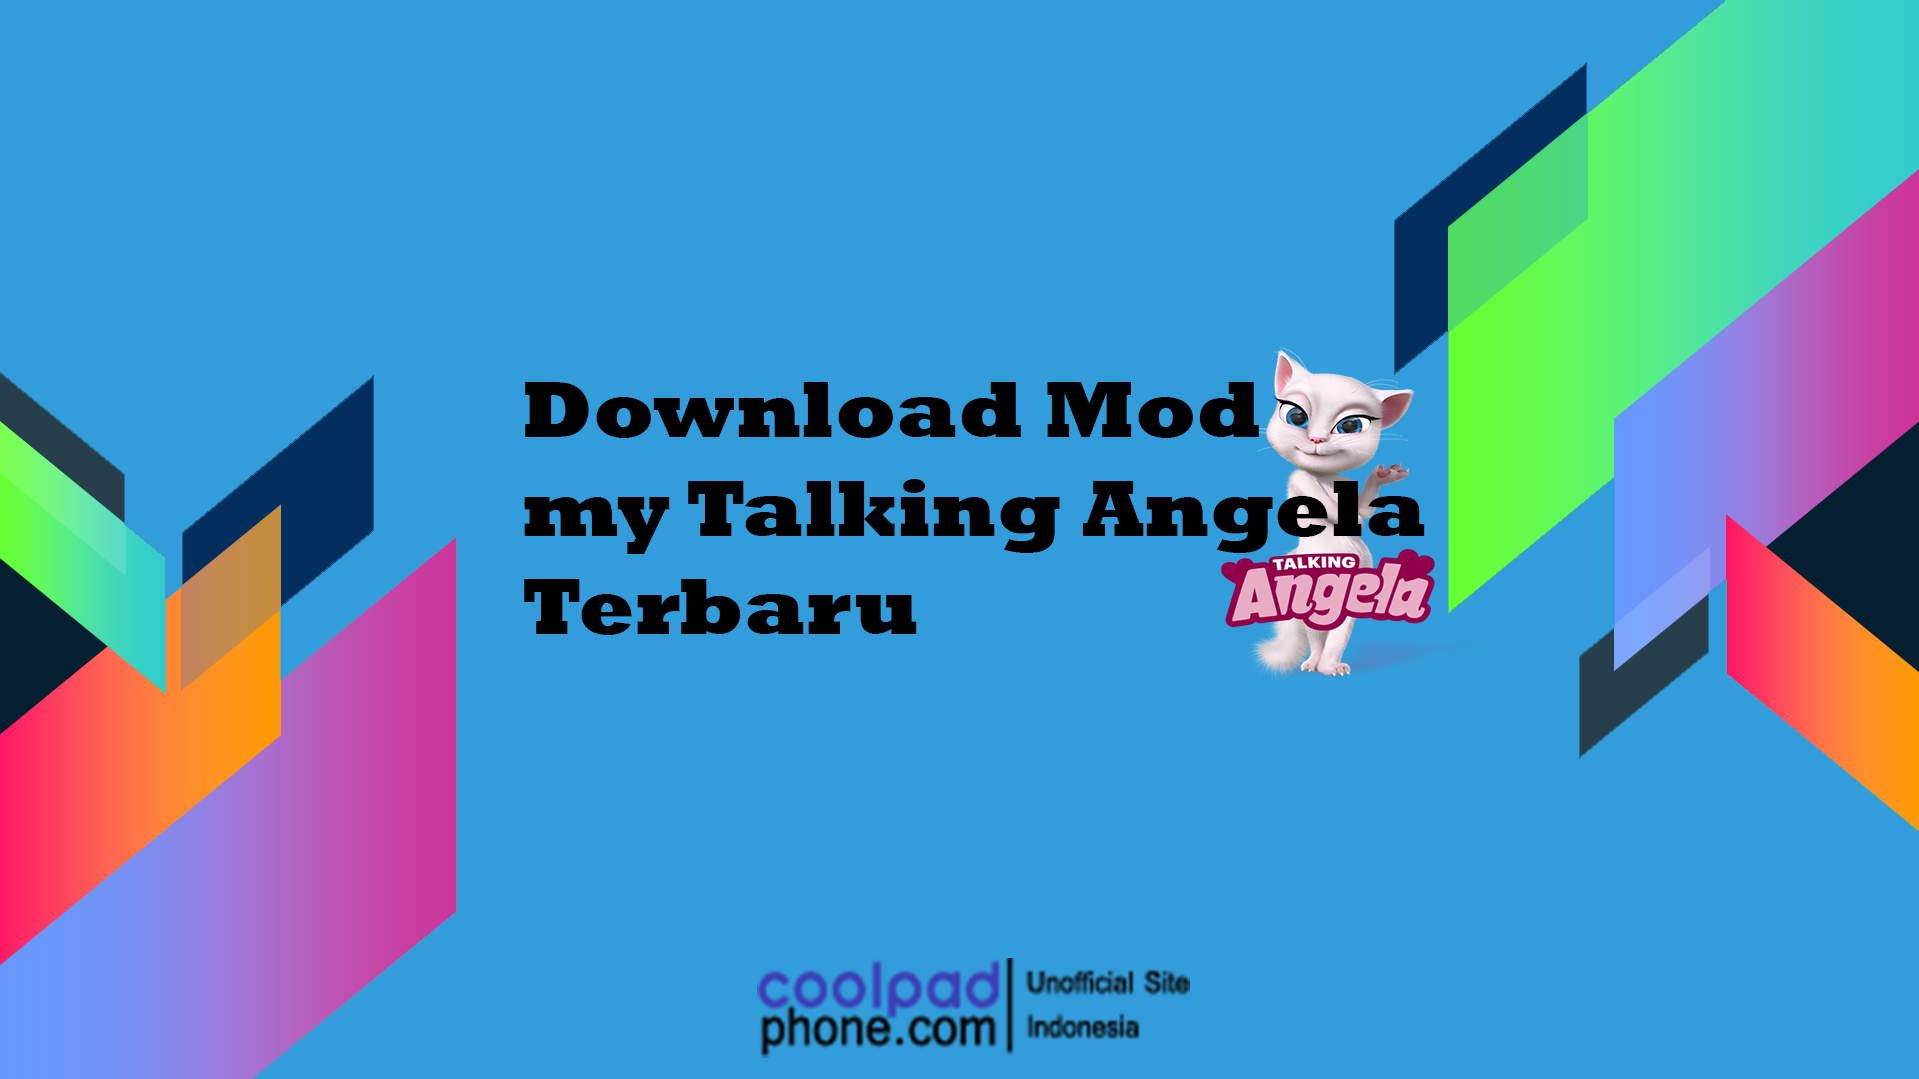 download mod my talking angela